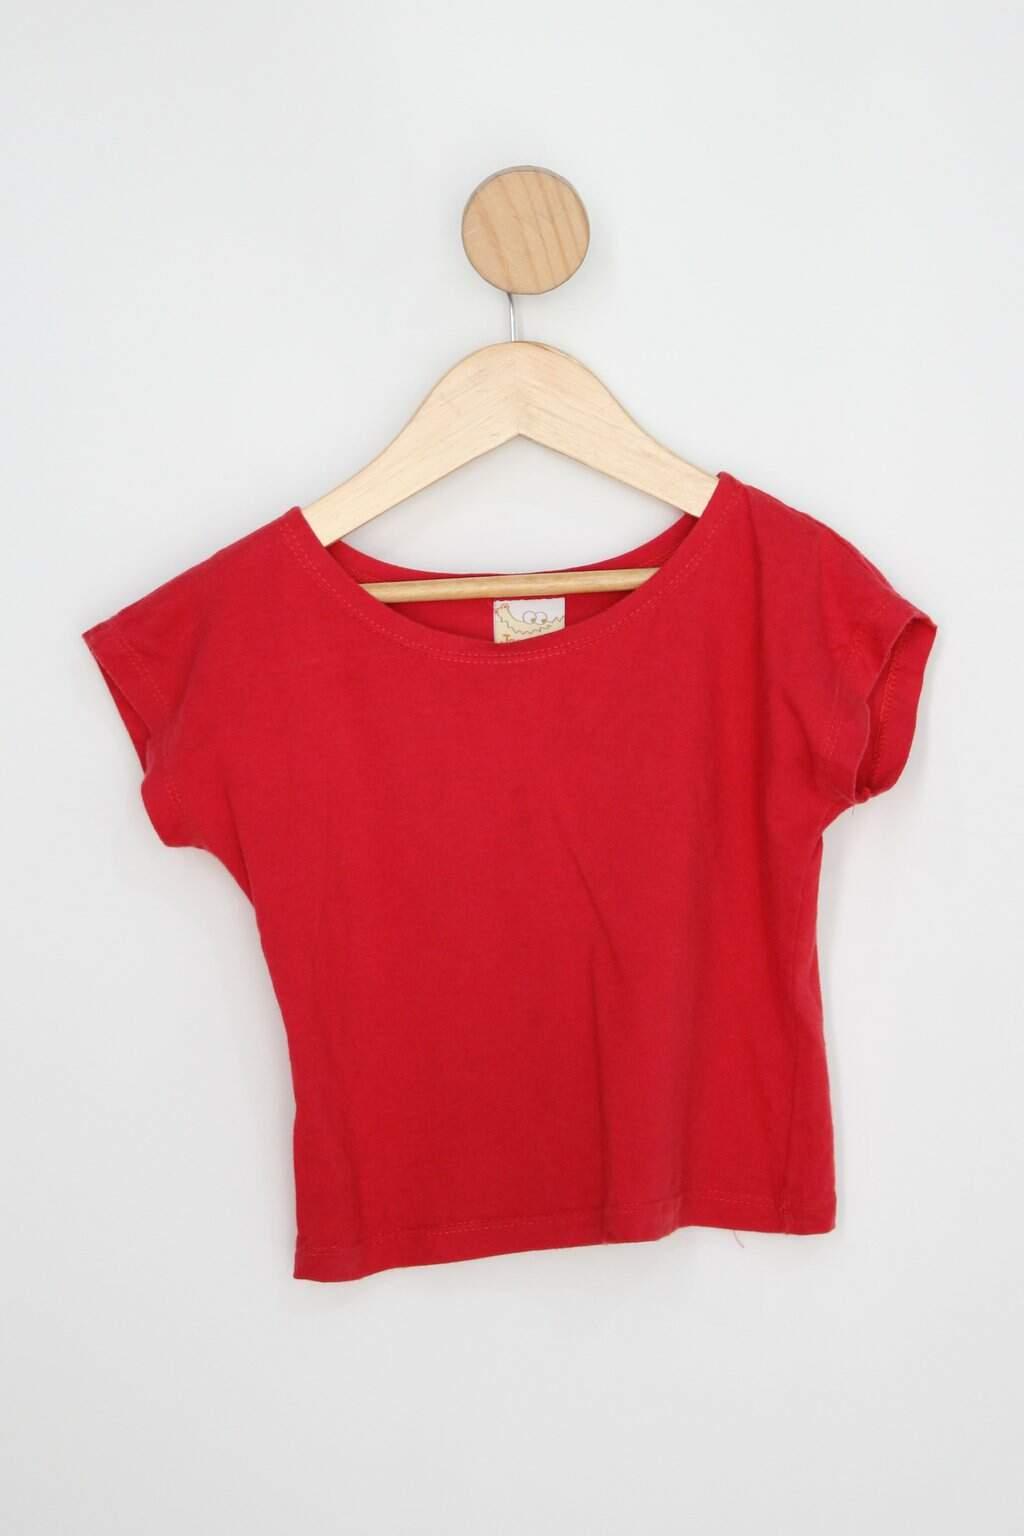 Camiseta Infantil Jaca-lélé Vermelha